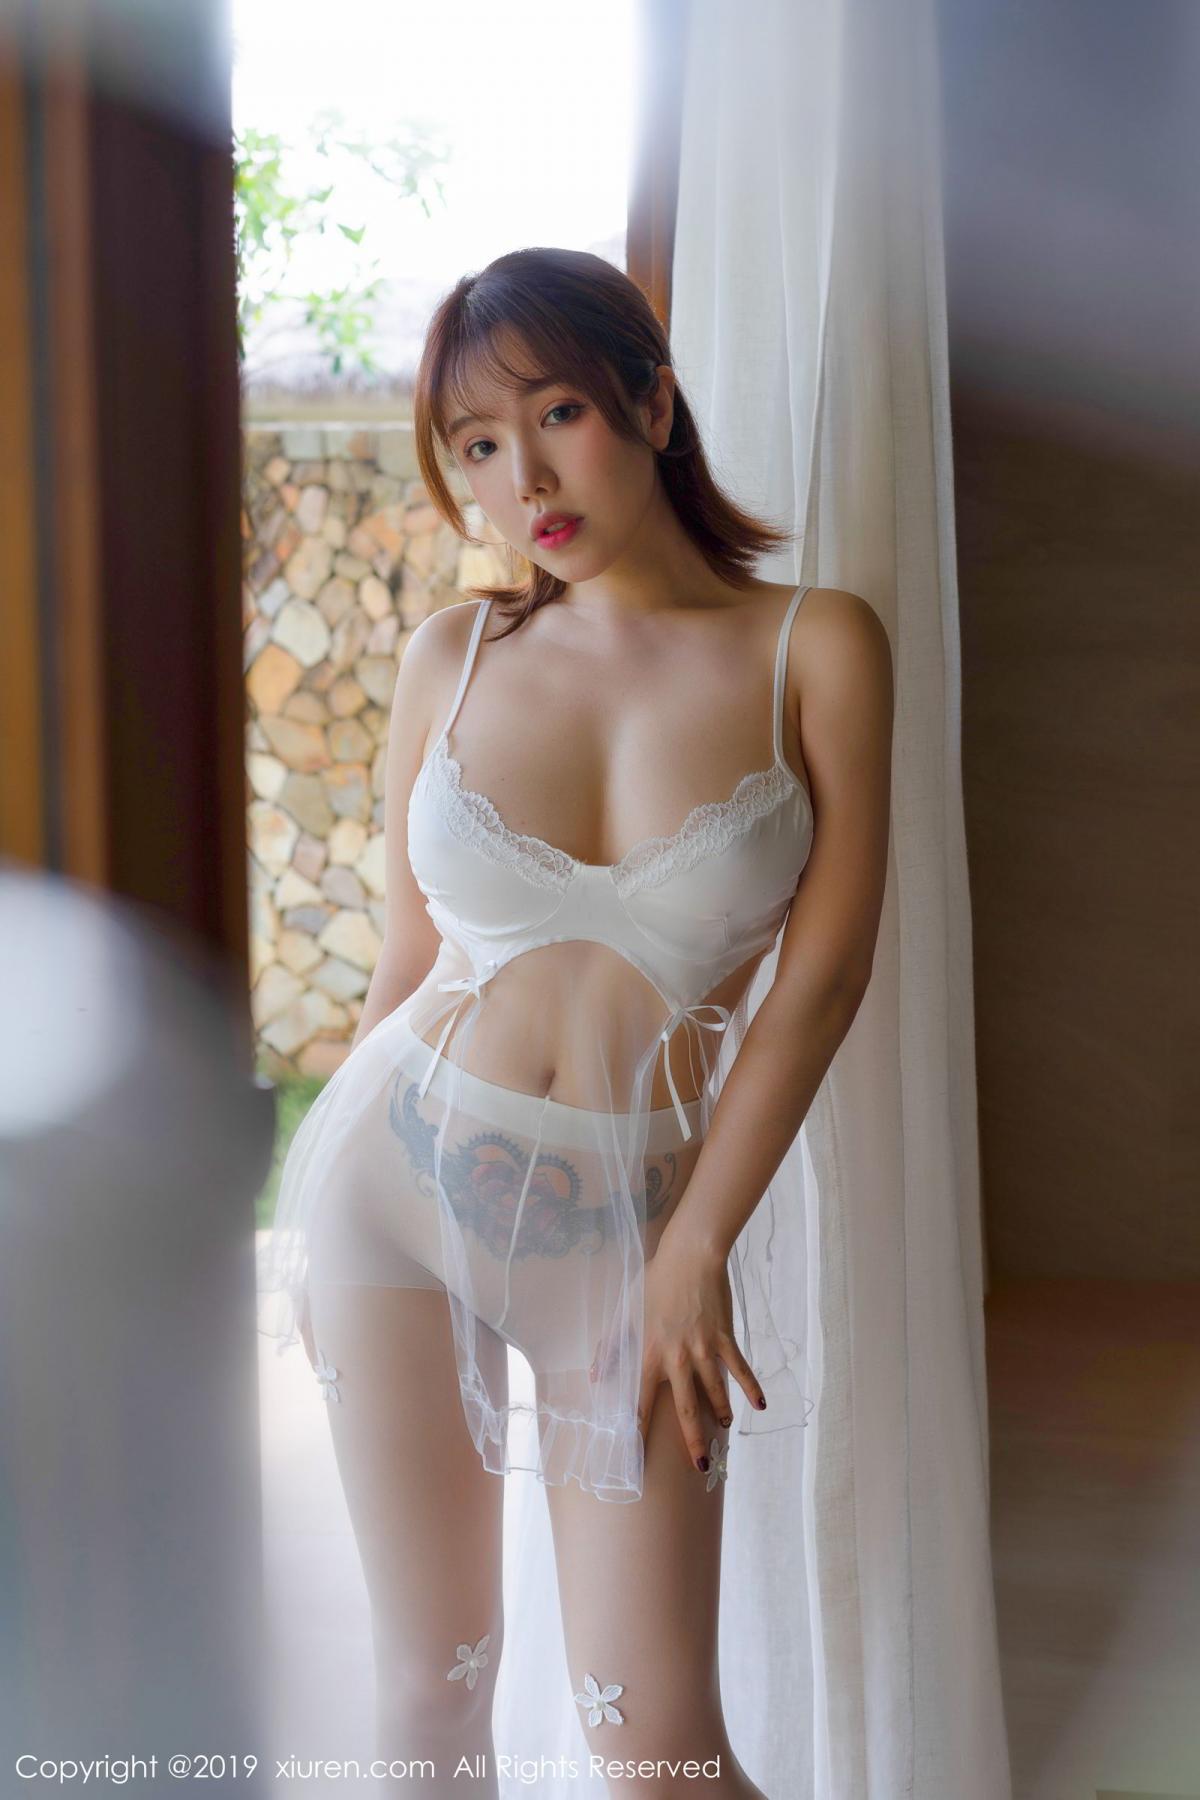 [XiuRen] Vol.1578 Huang Le Ran 1P, Huang Le Ran, Underwear, Xiuren